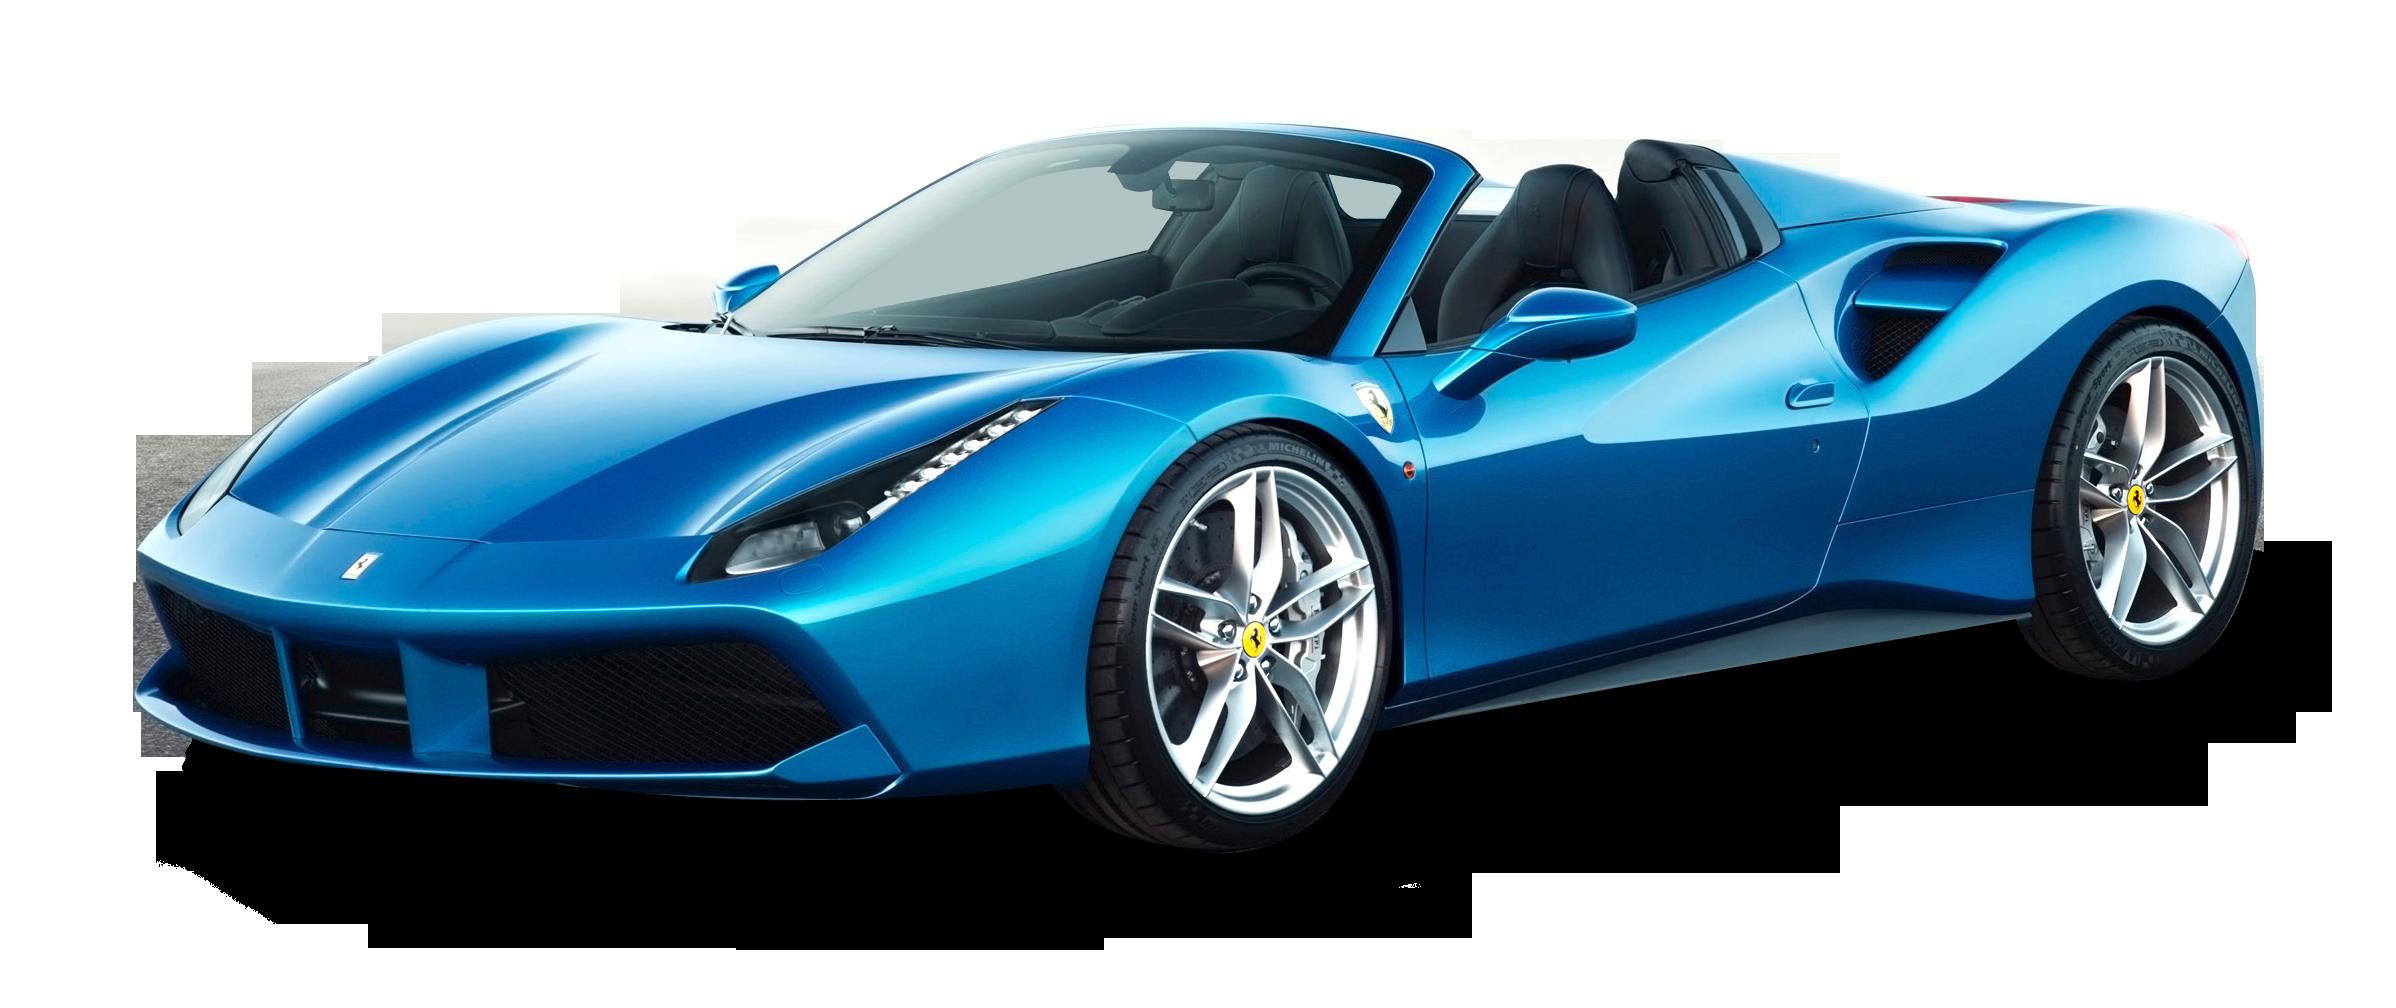 Blue Ferrari 488 Spider Car Png Image Ferrari Car Ferrari Ferrari 488